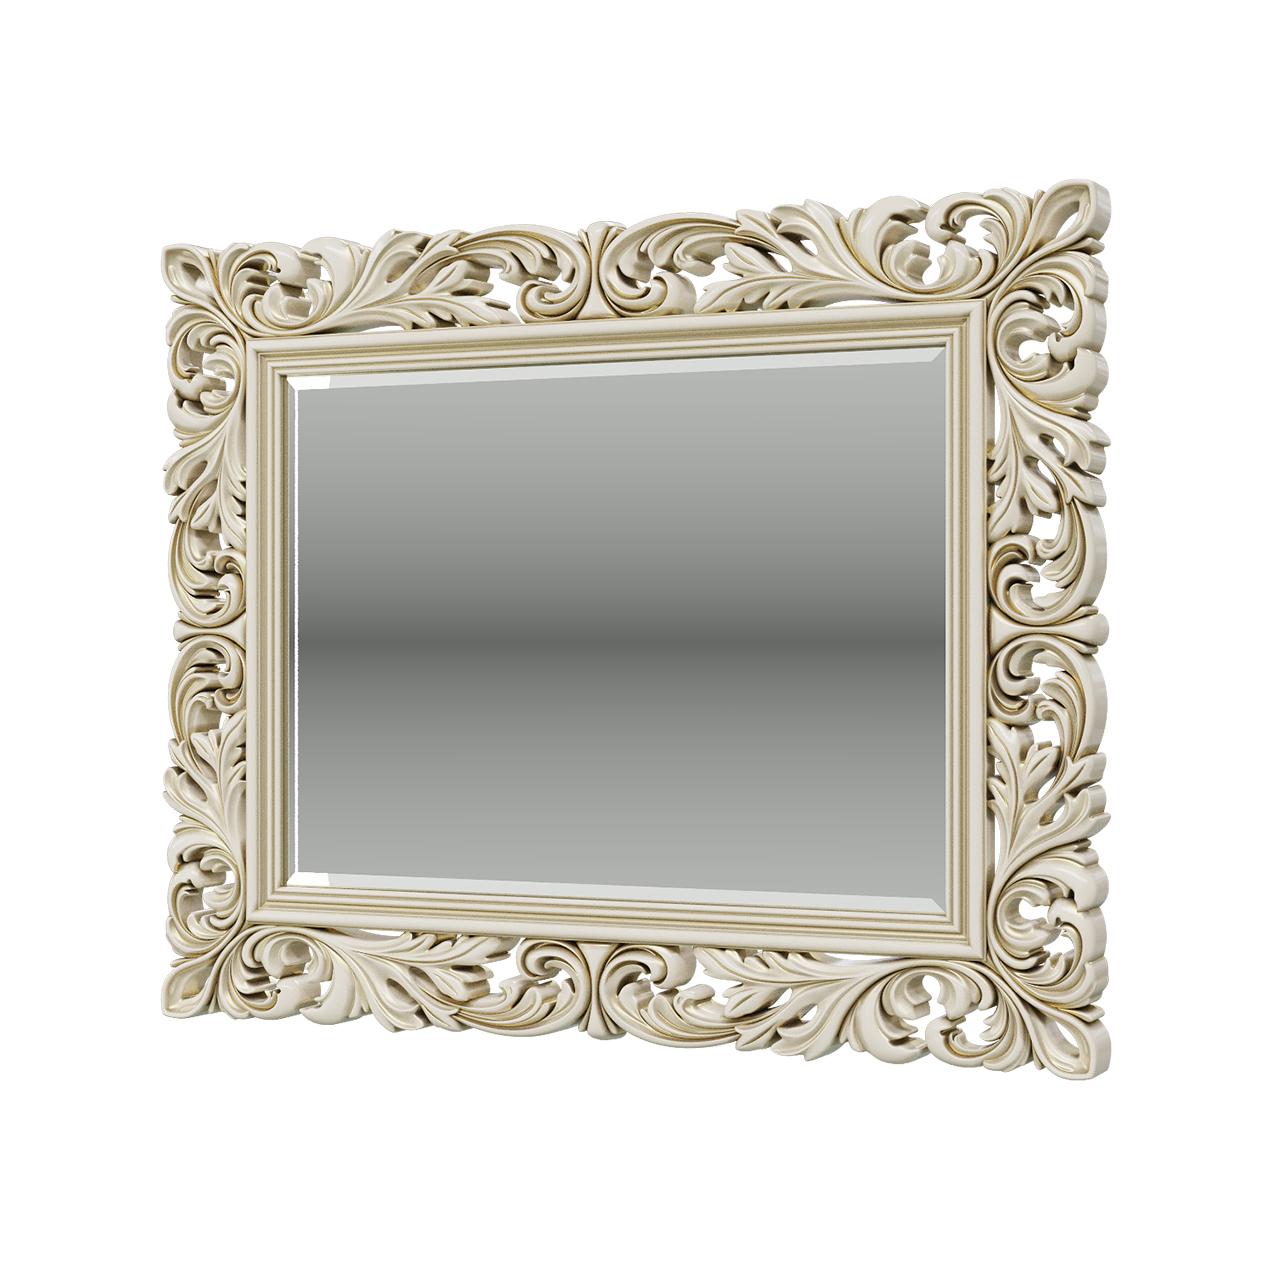 Зеркало Мэри-Мебель ЗК-04 слоновая кость, 108х6х88 см фото